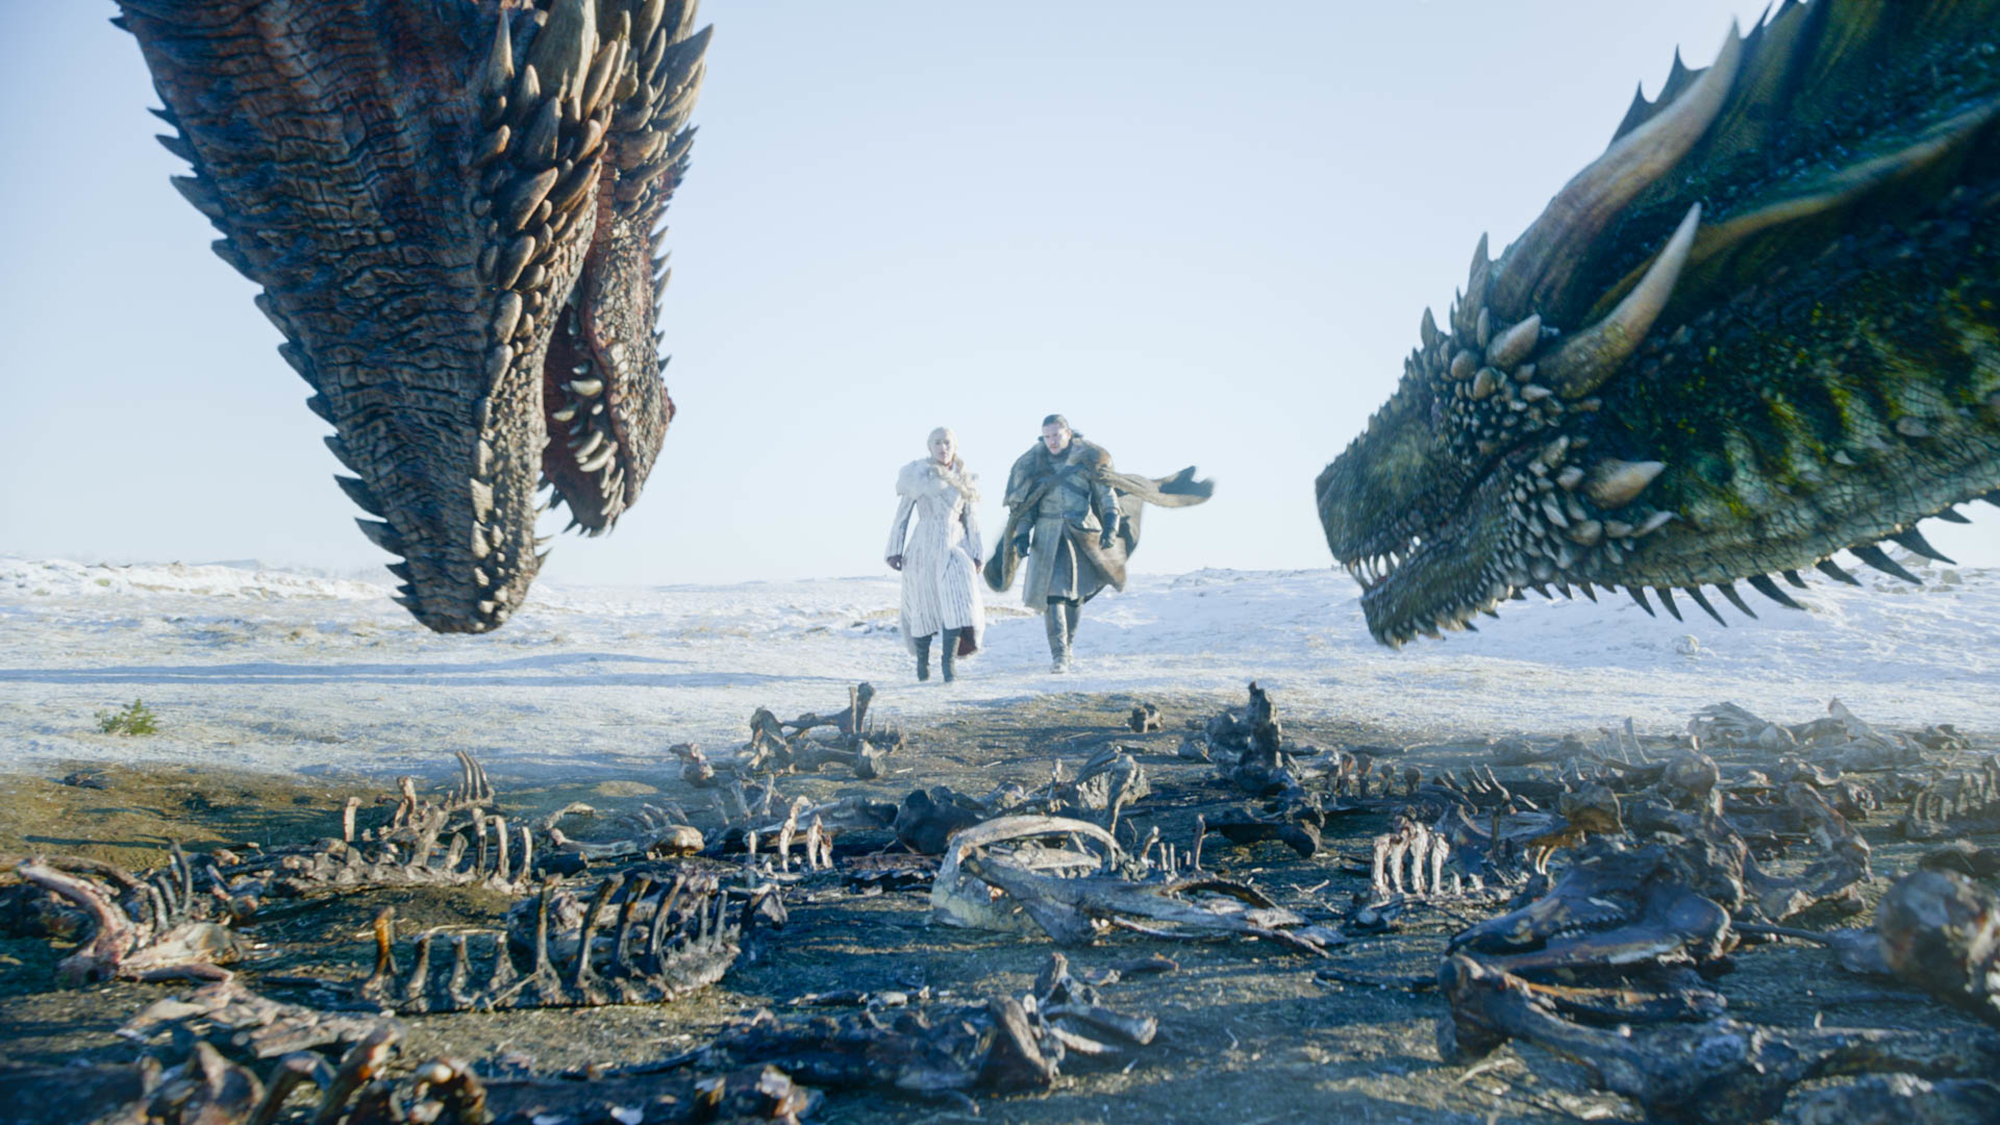 Game Of Thrones Season 8 Jon Snow And Daenerys Targaryen In